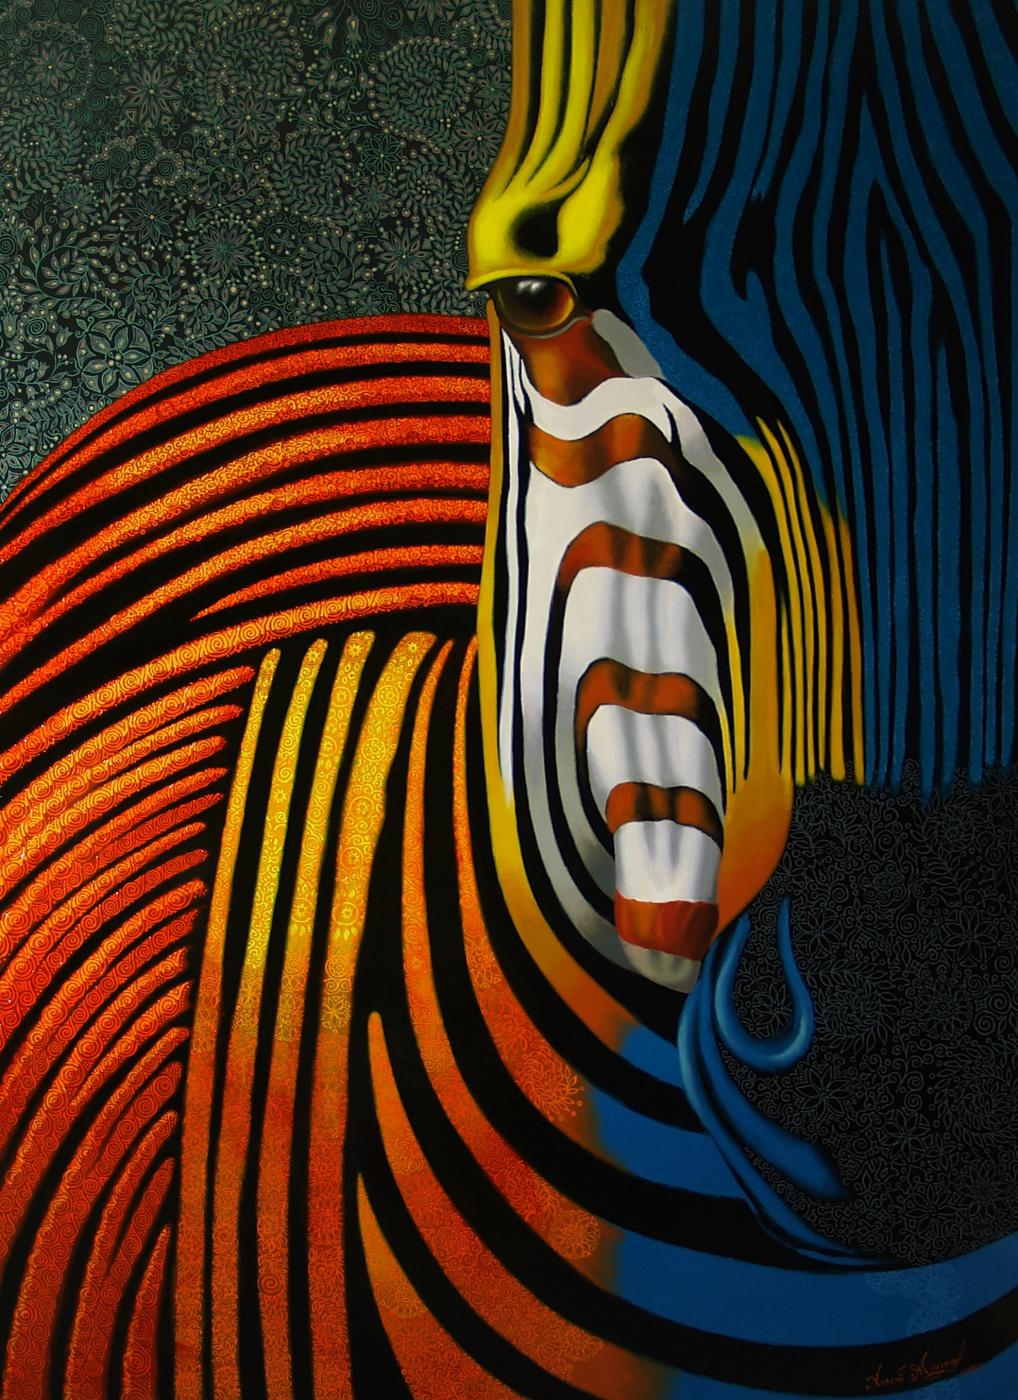 Алексей Петрович Акиндинов. Zebra # 2